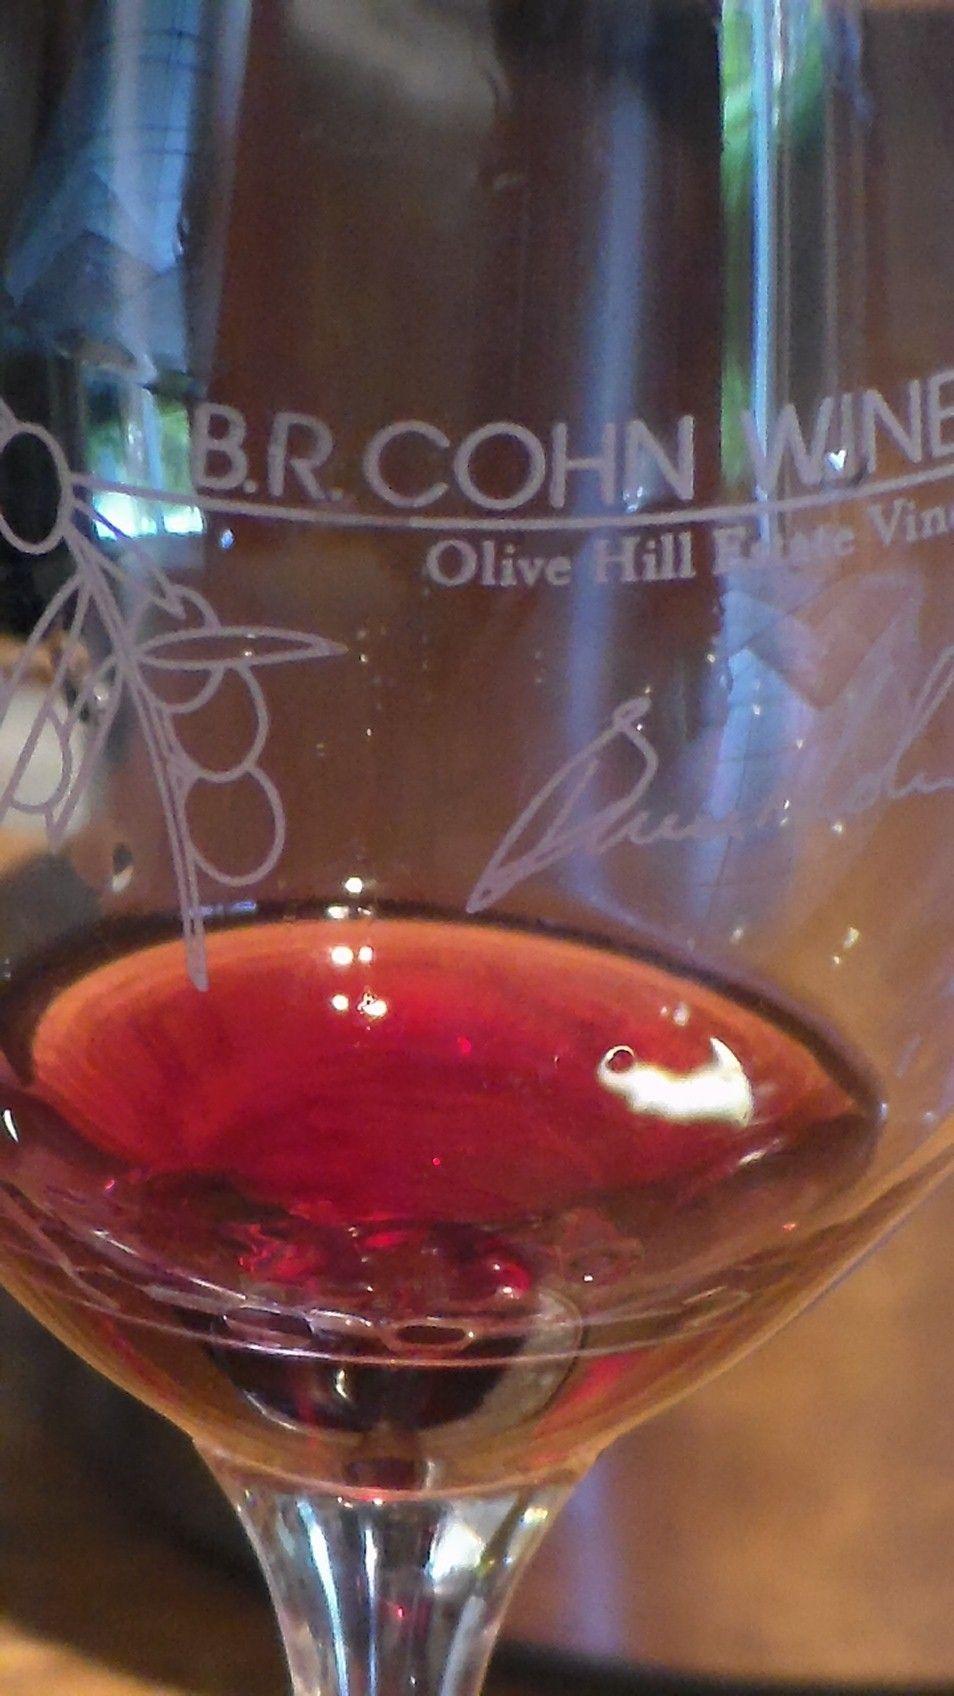 Br Cohn Pinot Nior Wines Alcoholic Drinks Rose Wine